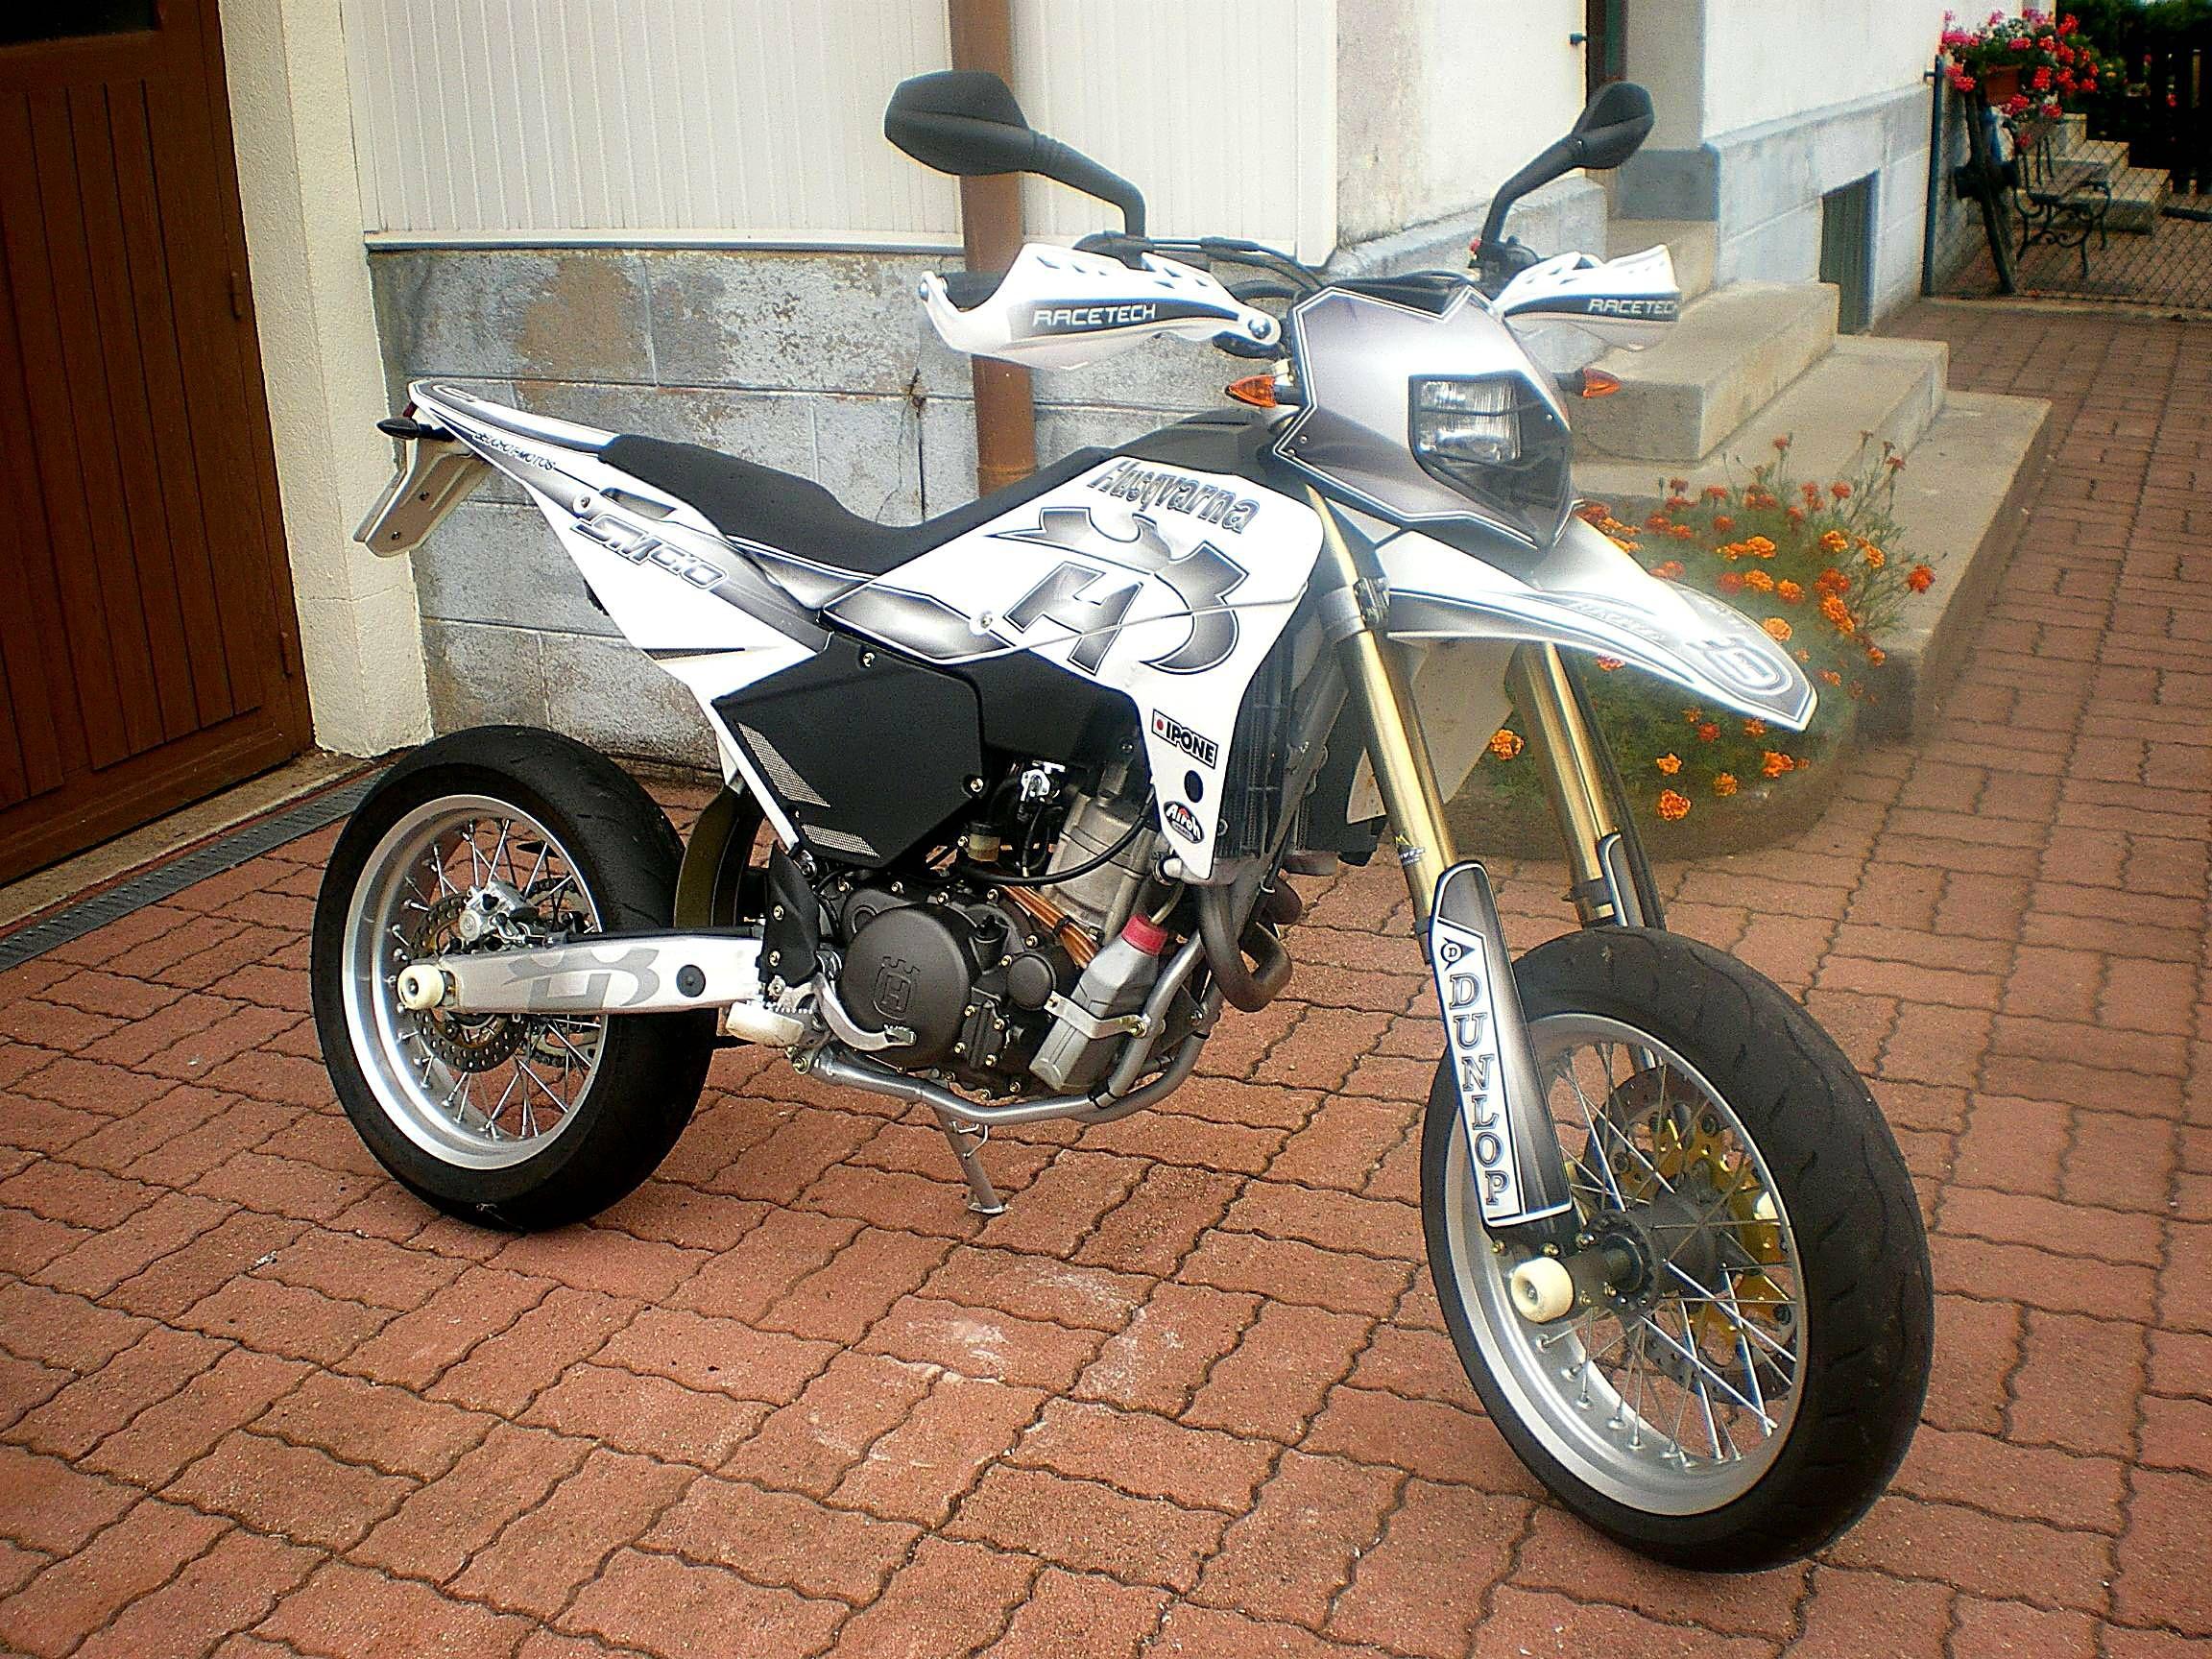 husqvarna 610 sm motorcycles motorbikes motorbike bike. Black Bedroom Furniture Sets. Home Design Ideas